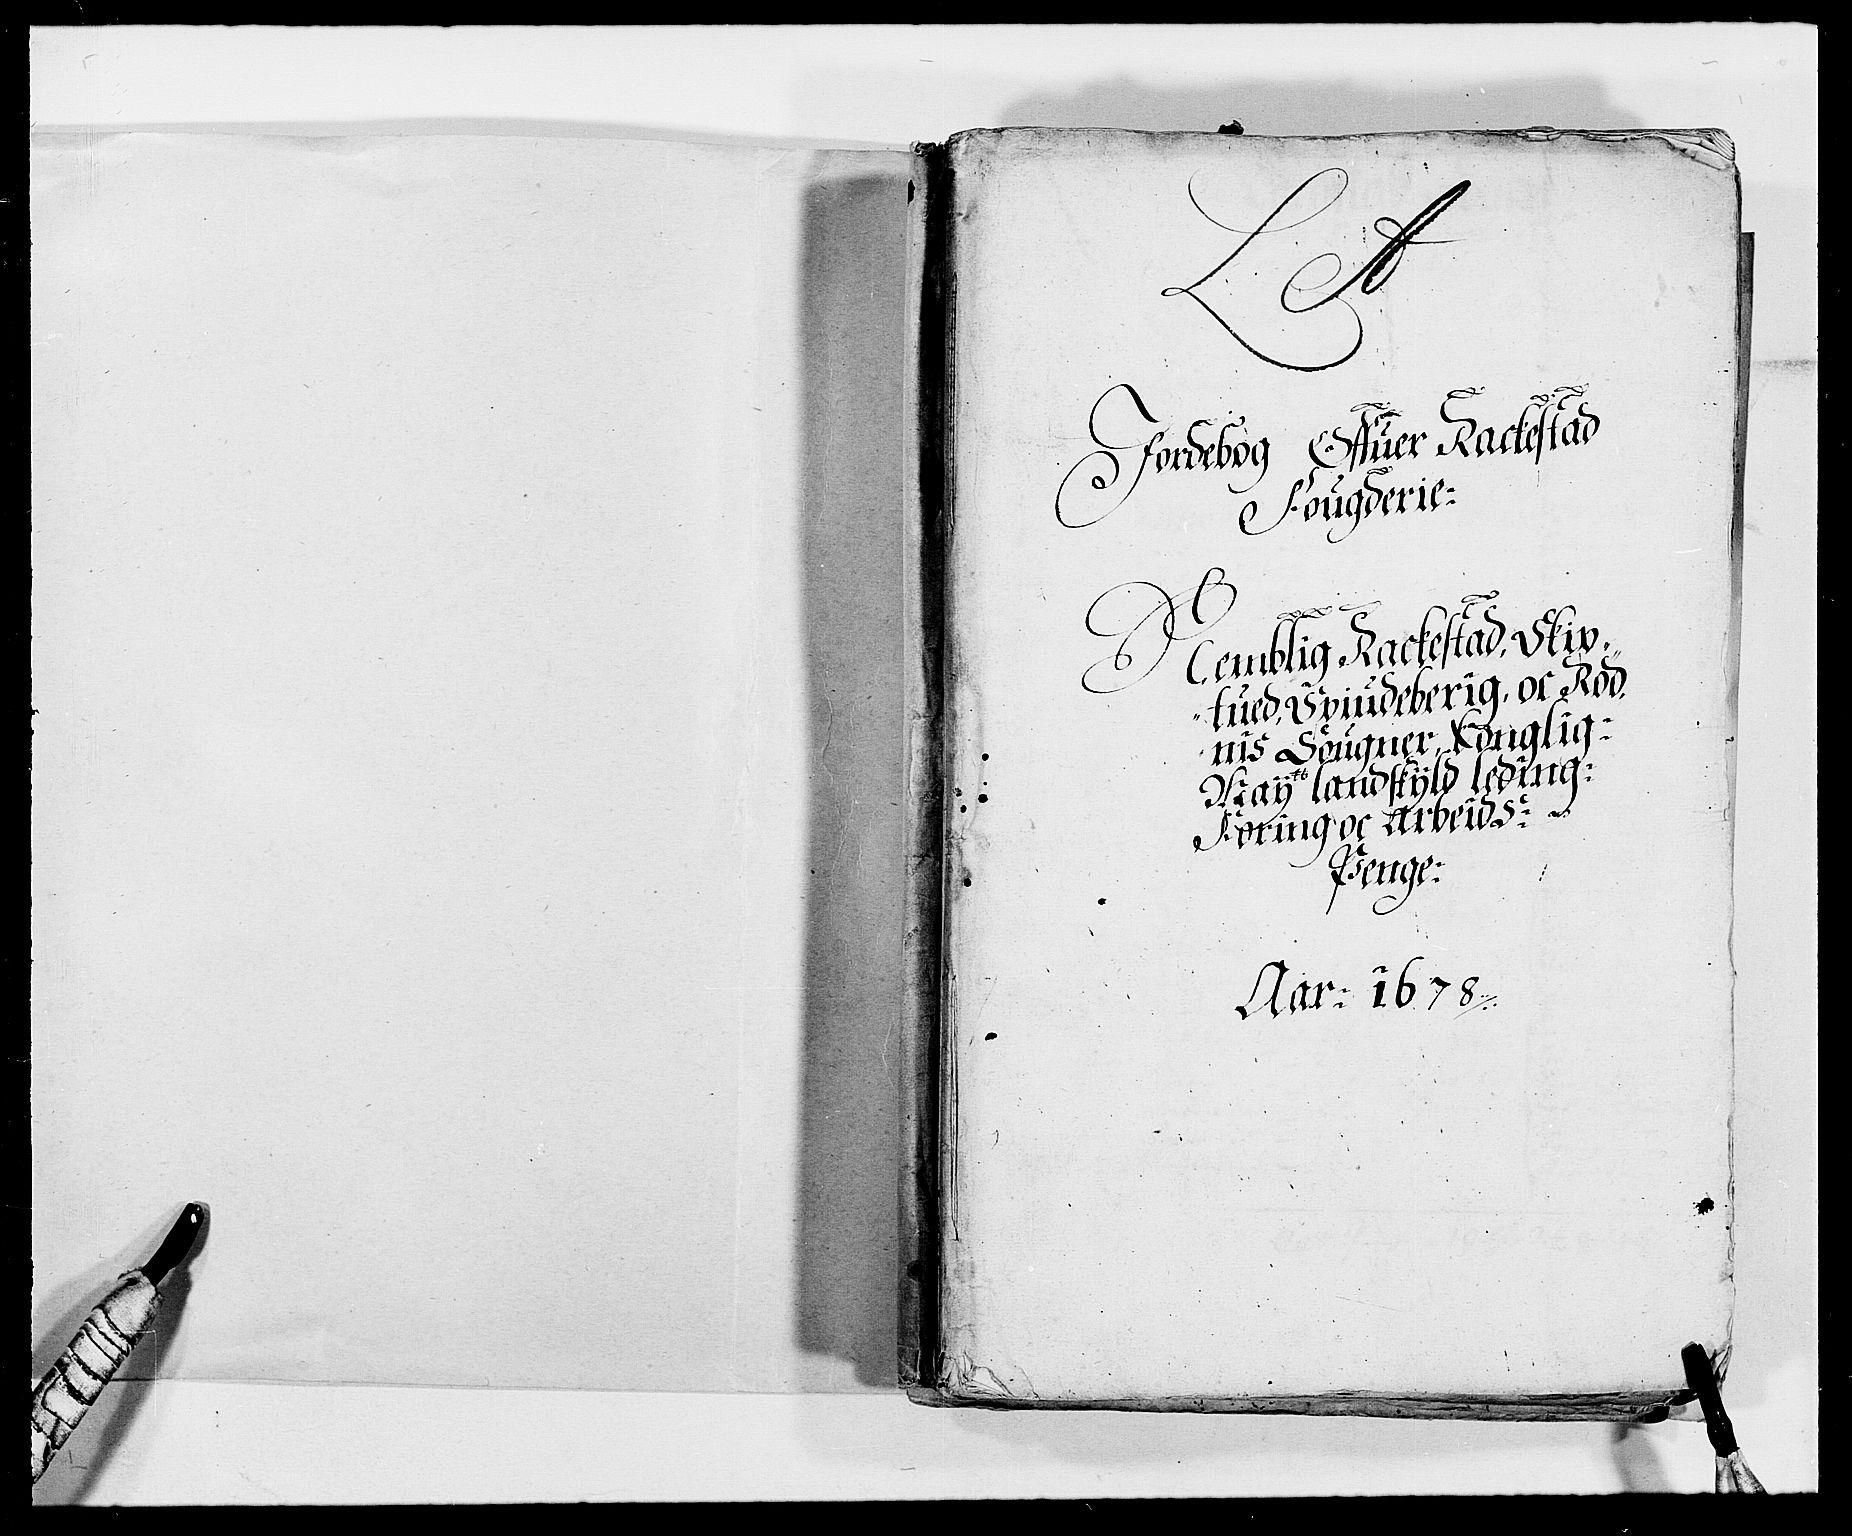 RA, Rentekammeret inntil 1814, Reviderte regnskaper, Fogderegnskap, R05/L0271: Fogderegnskap Rakkestad, 1678-1679, s. 2